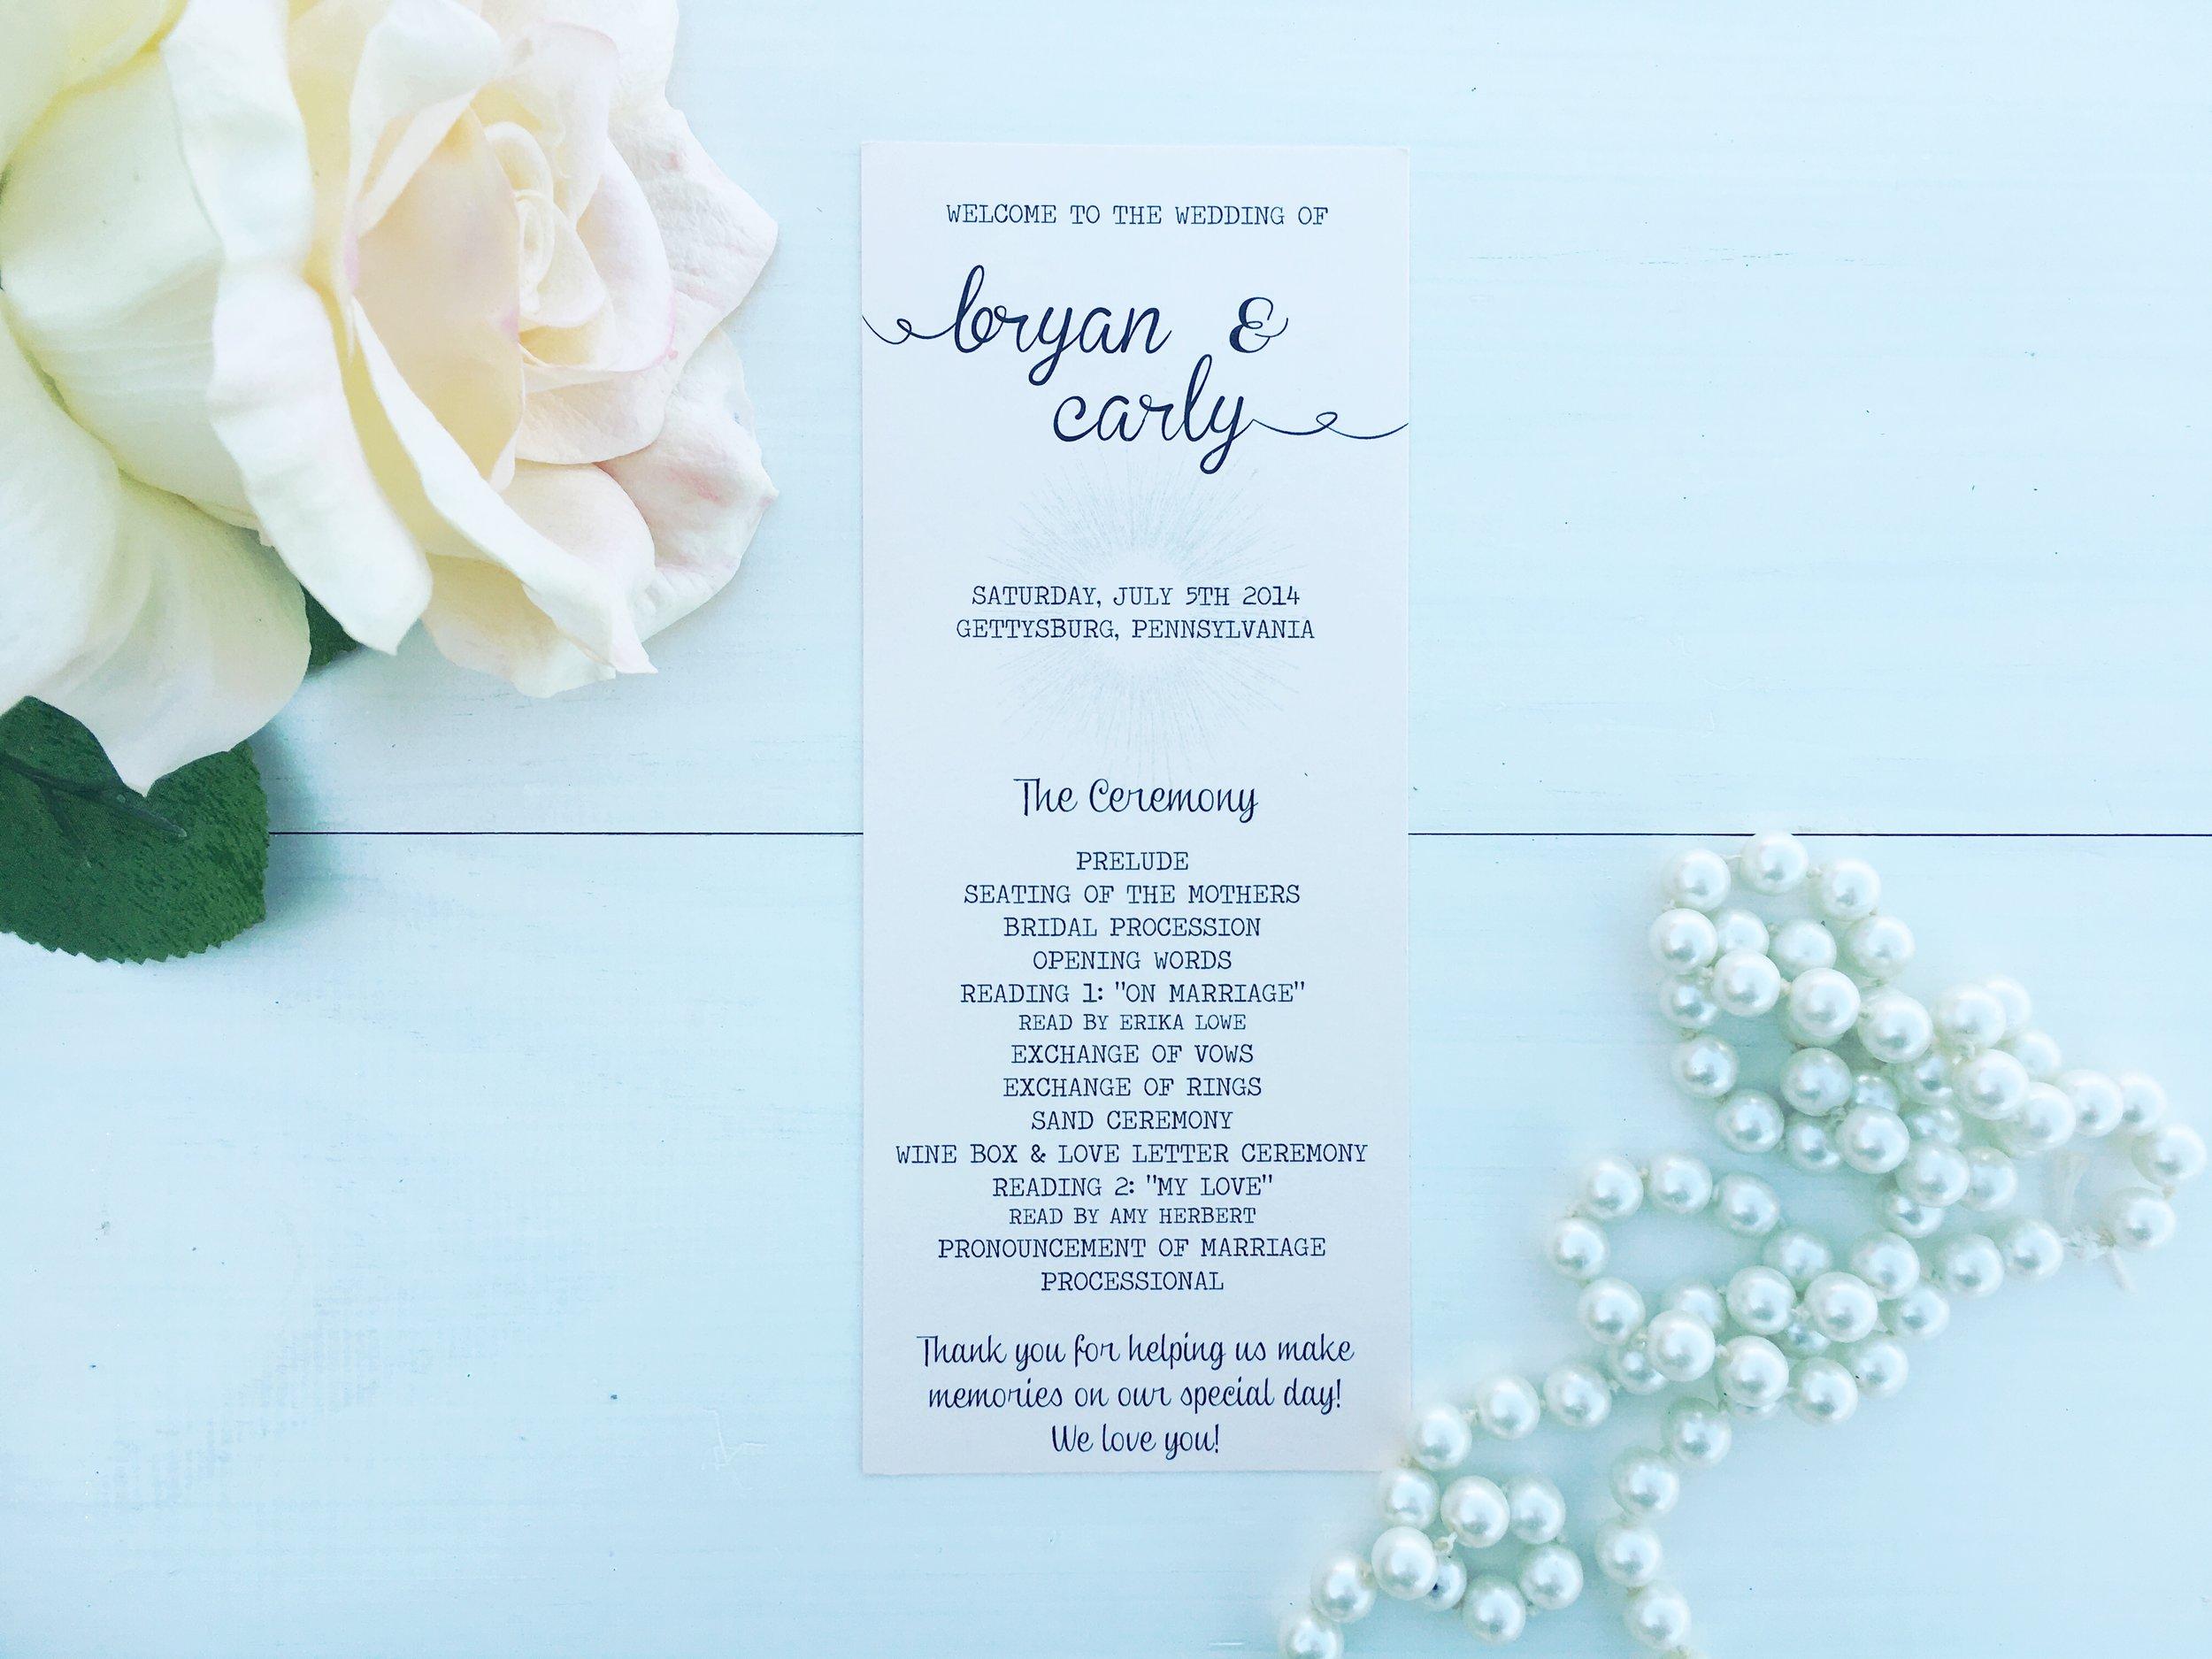 Central PA, York PA, JesSmith Designs, custom, wedding, invitations, bridal, announcements, save the date, baby, hanover, calligraphy, baltimore, wedding invitations, lancaster, gettysburg 8.jpg